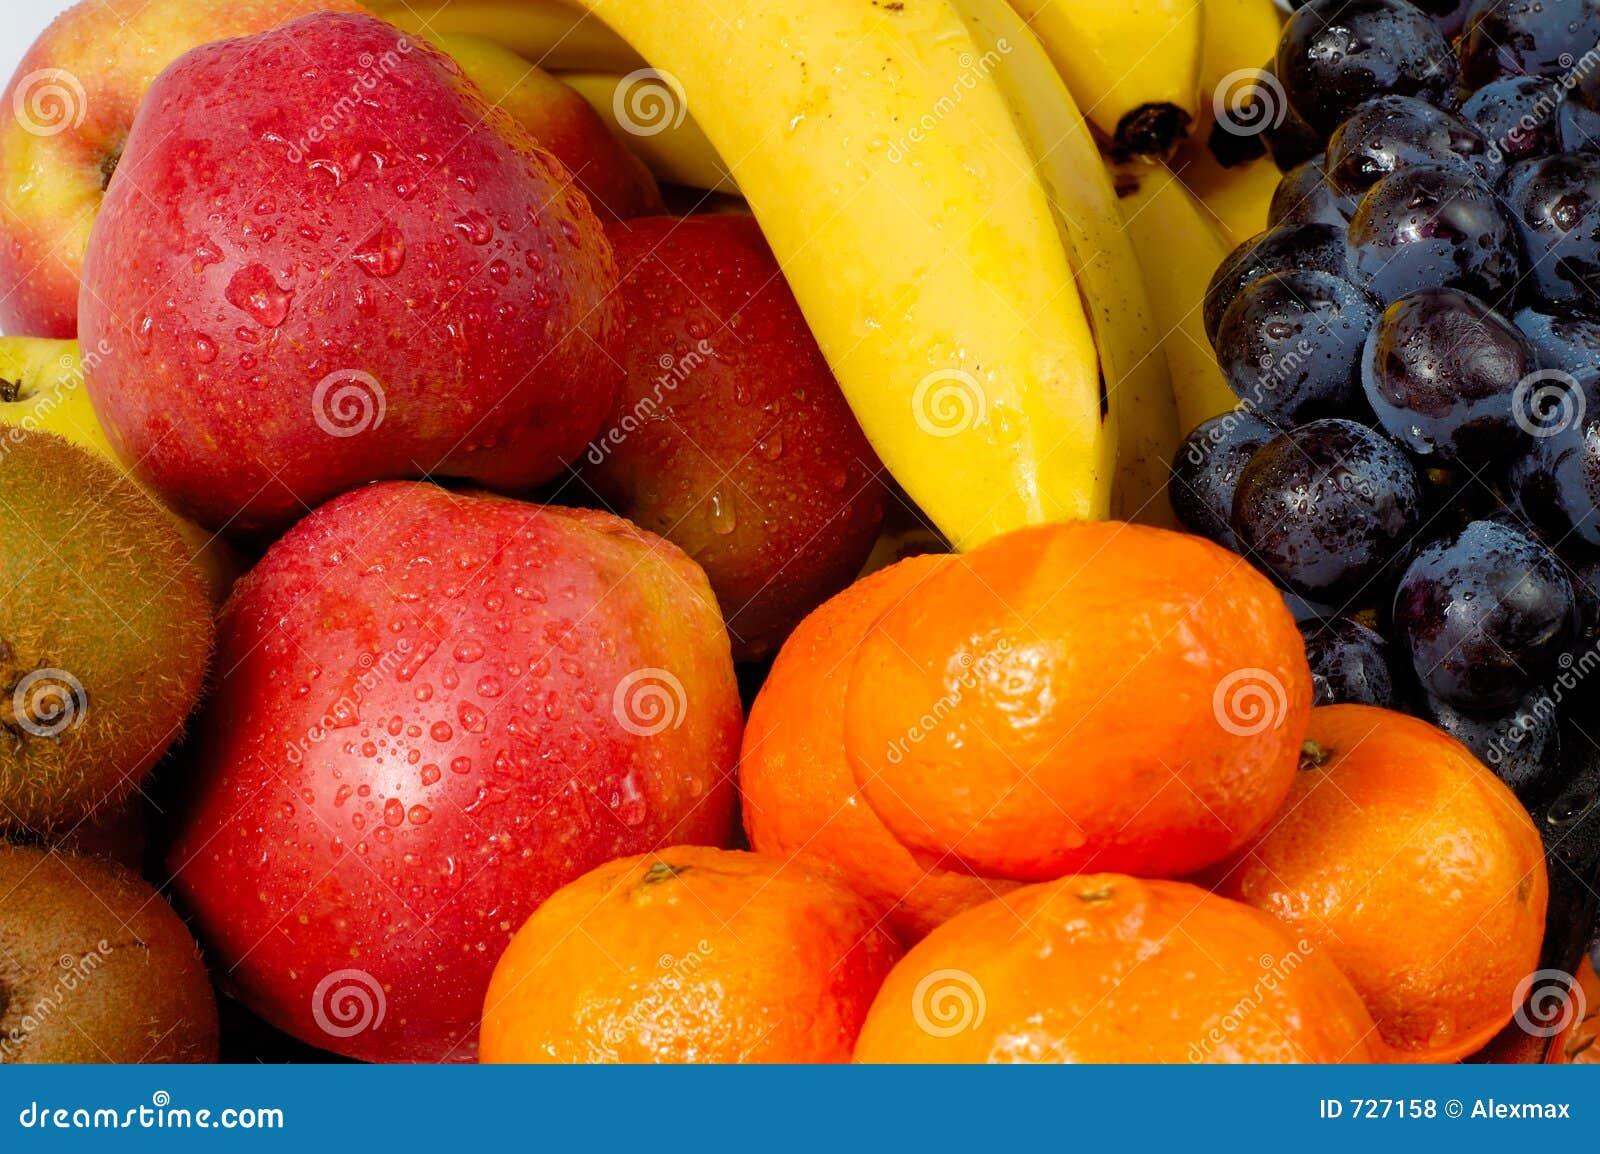 Fruits2a